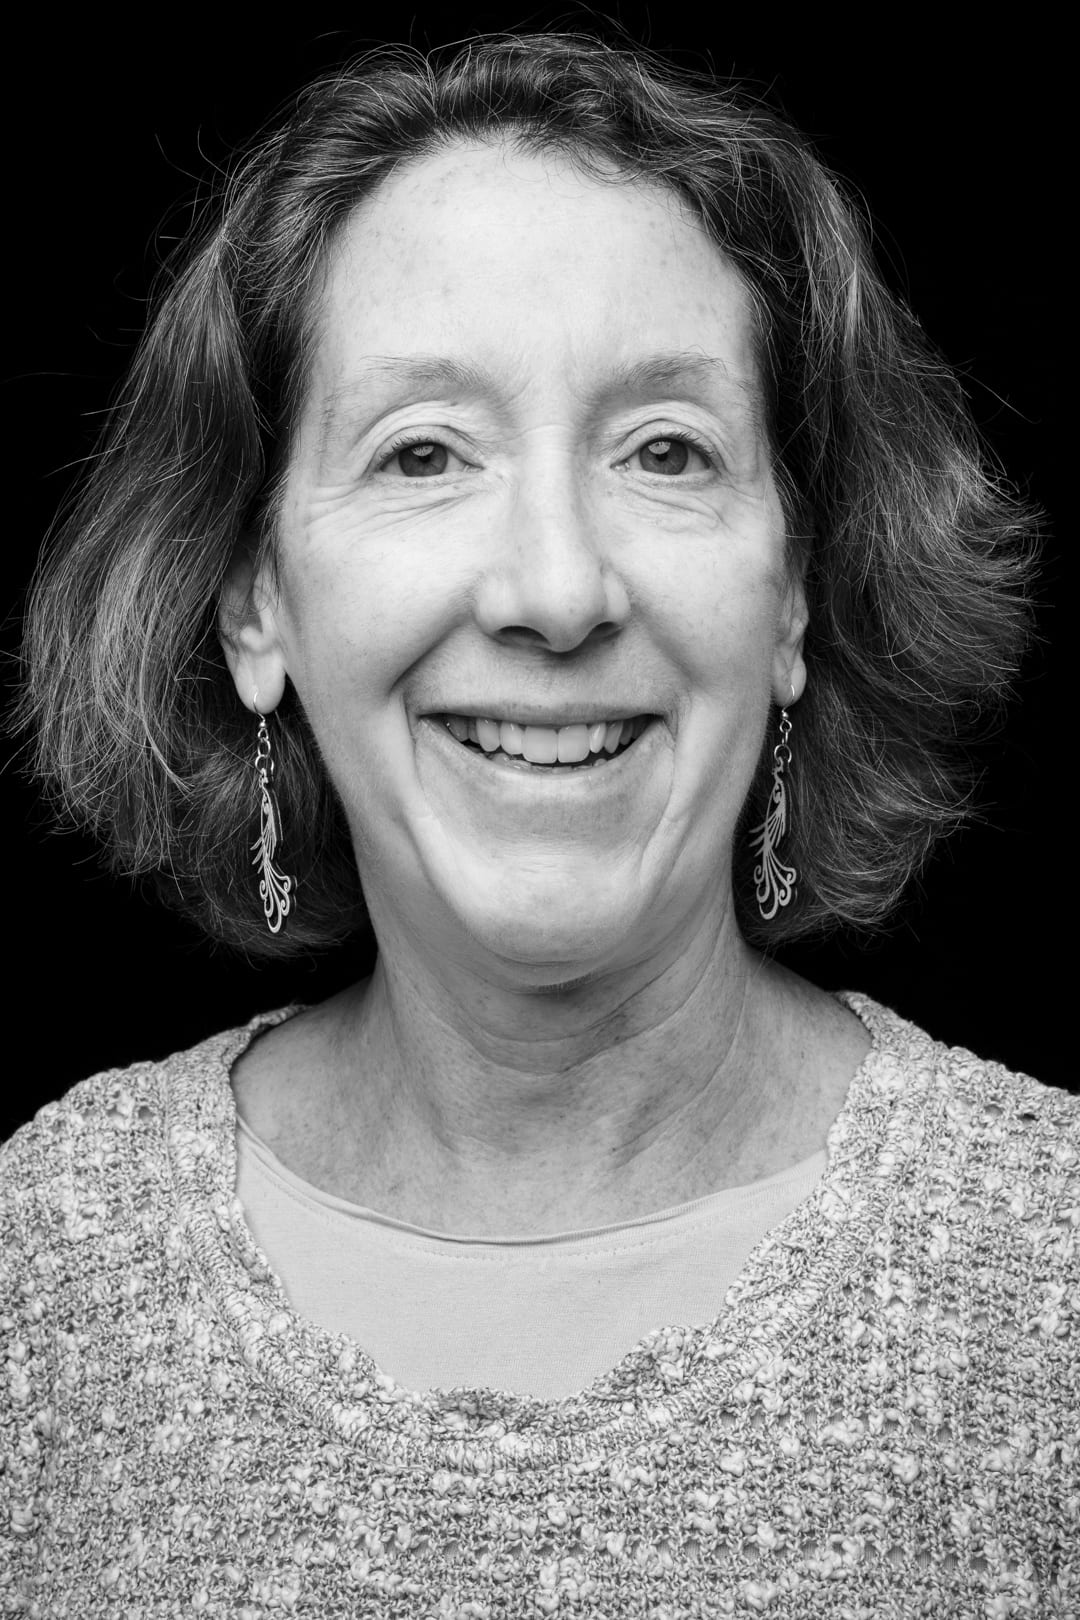 Suzanne Simons